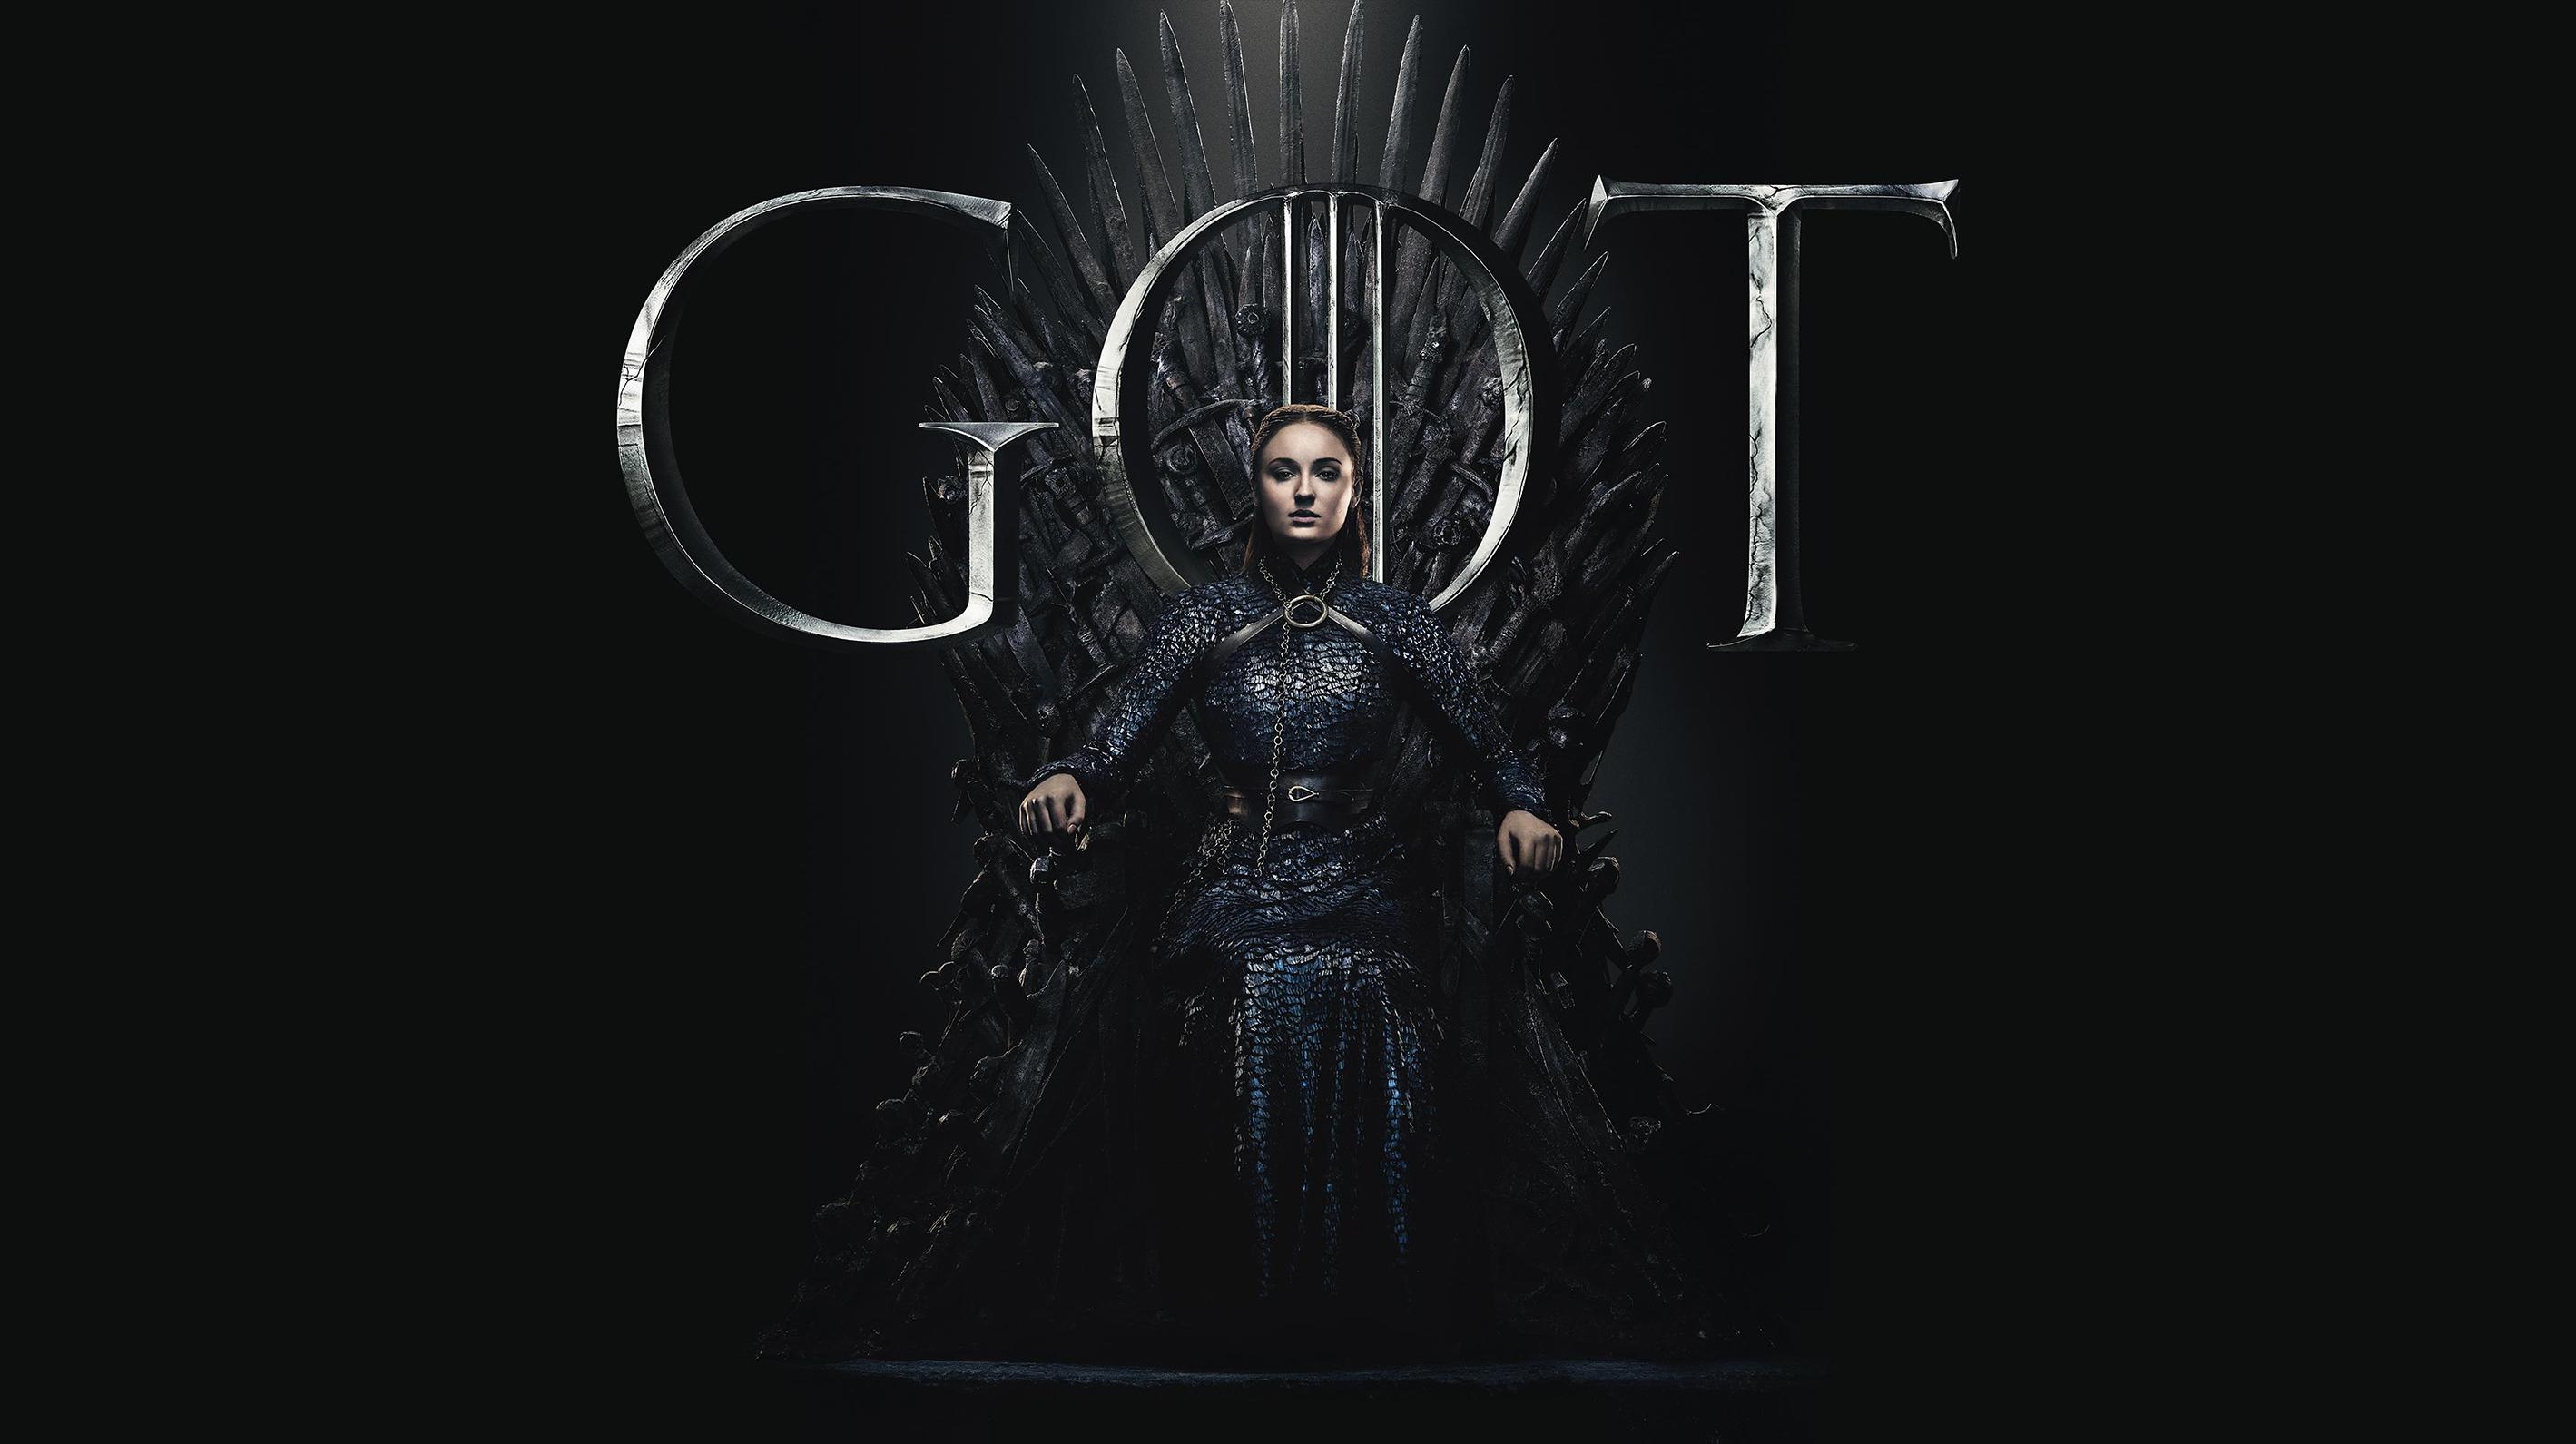 Sansa Stark Game Of Thrones Season 8 Poster Wallpaper, HD